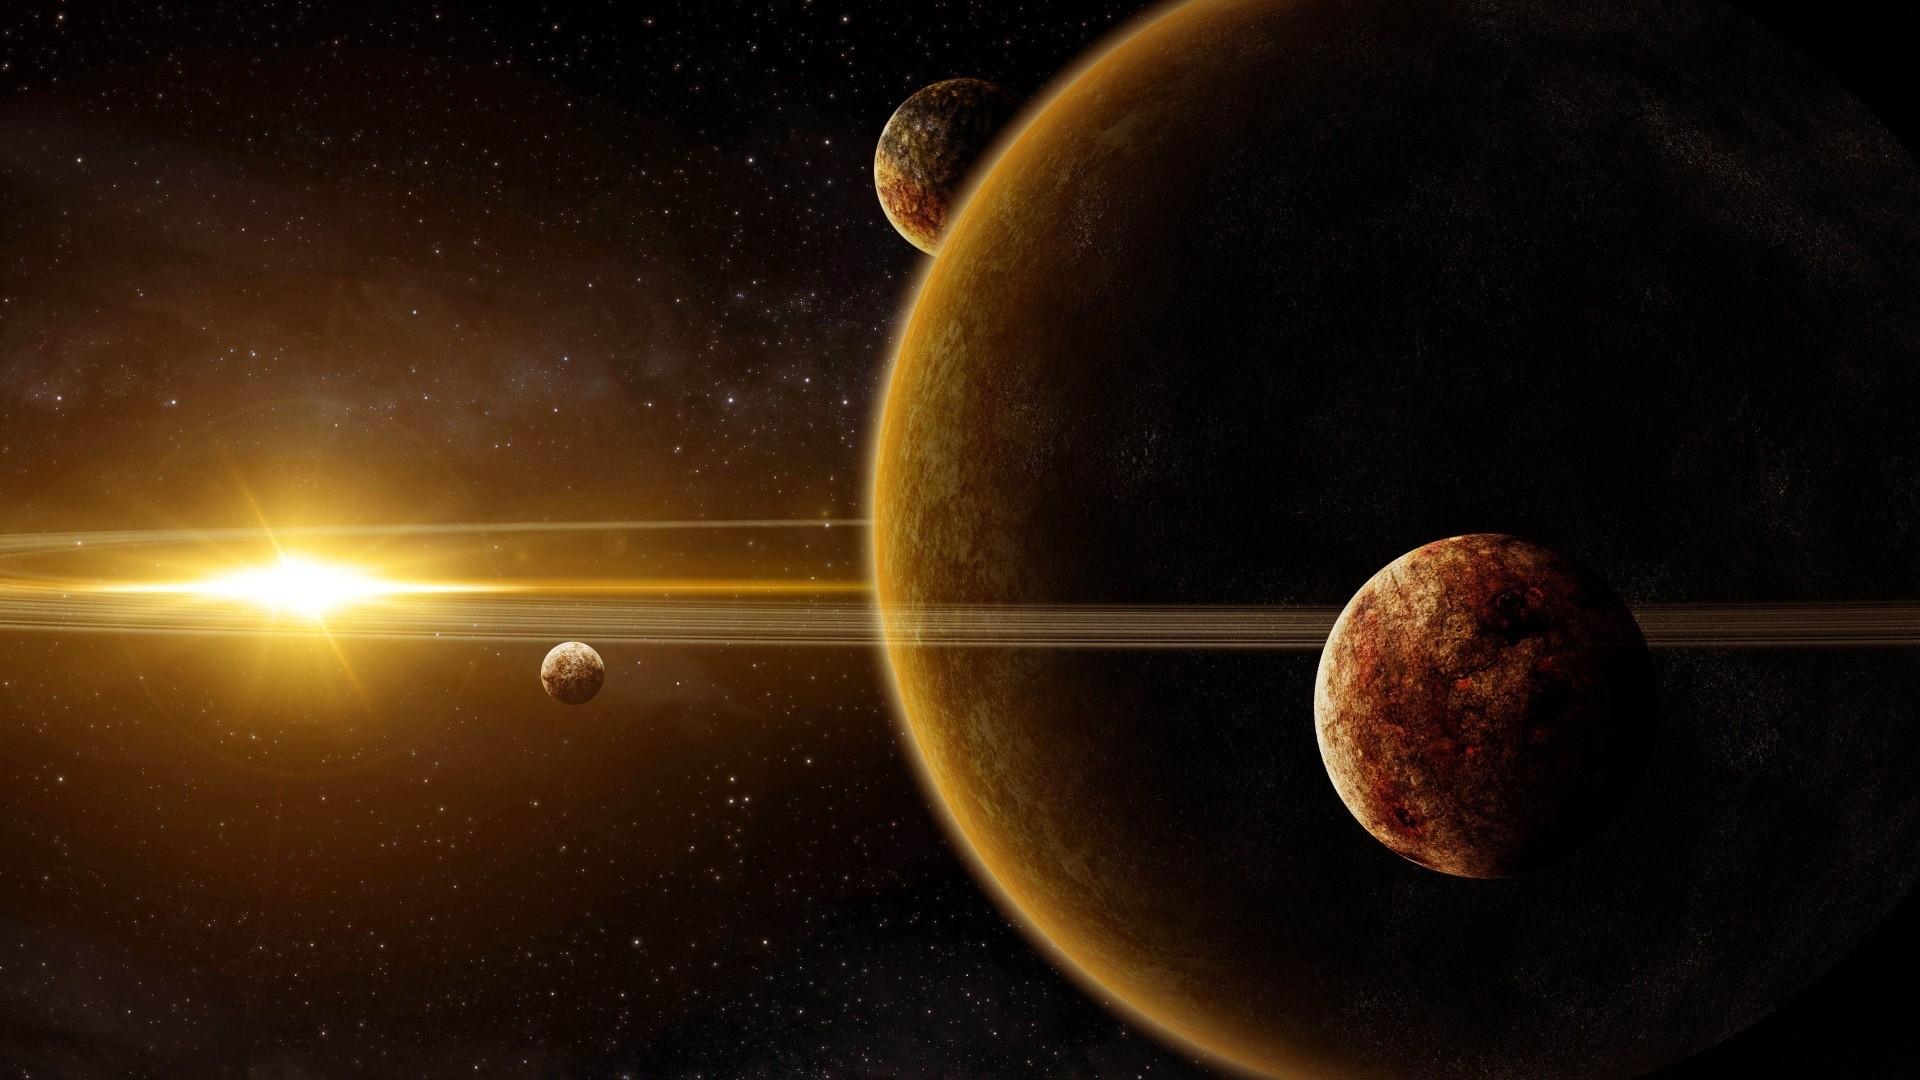 Solar System Wallpaper image hd